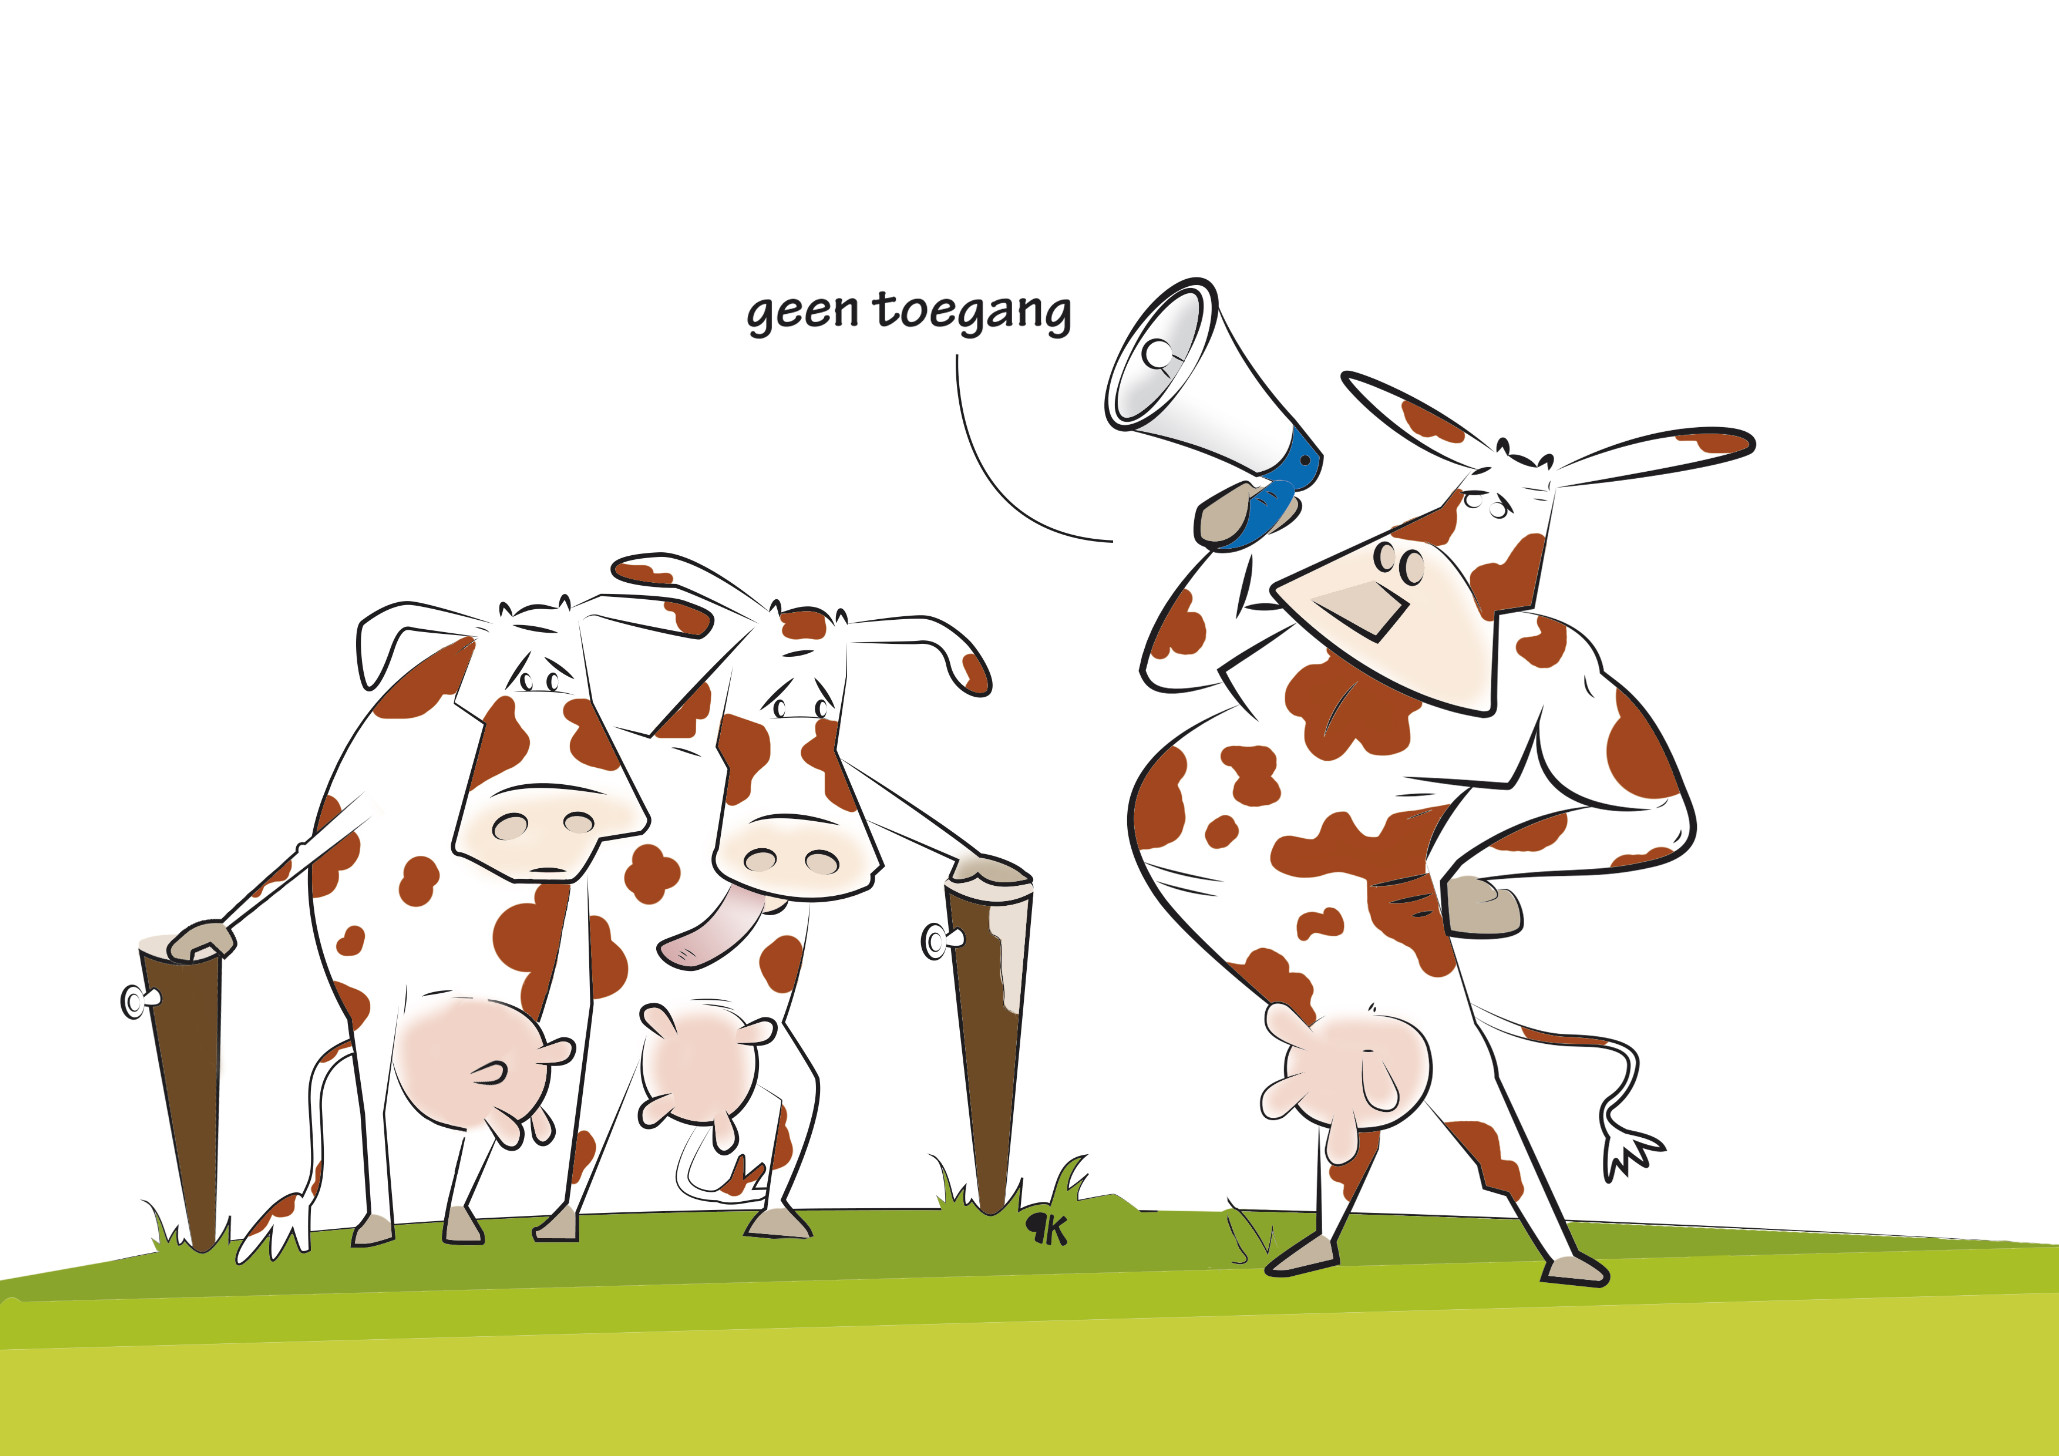 'Gemeente, stop megastal Wichmond'